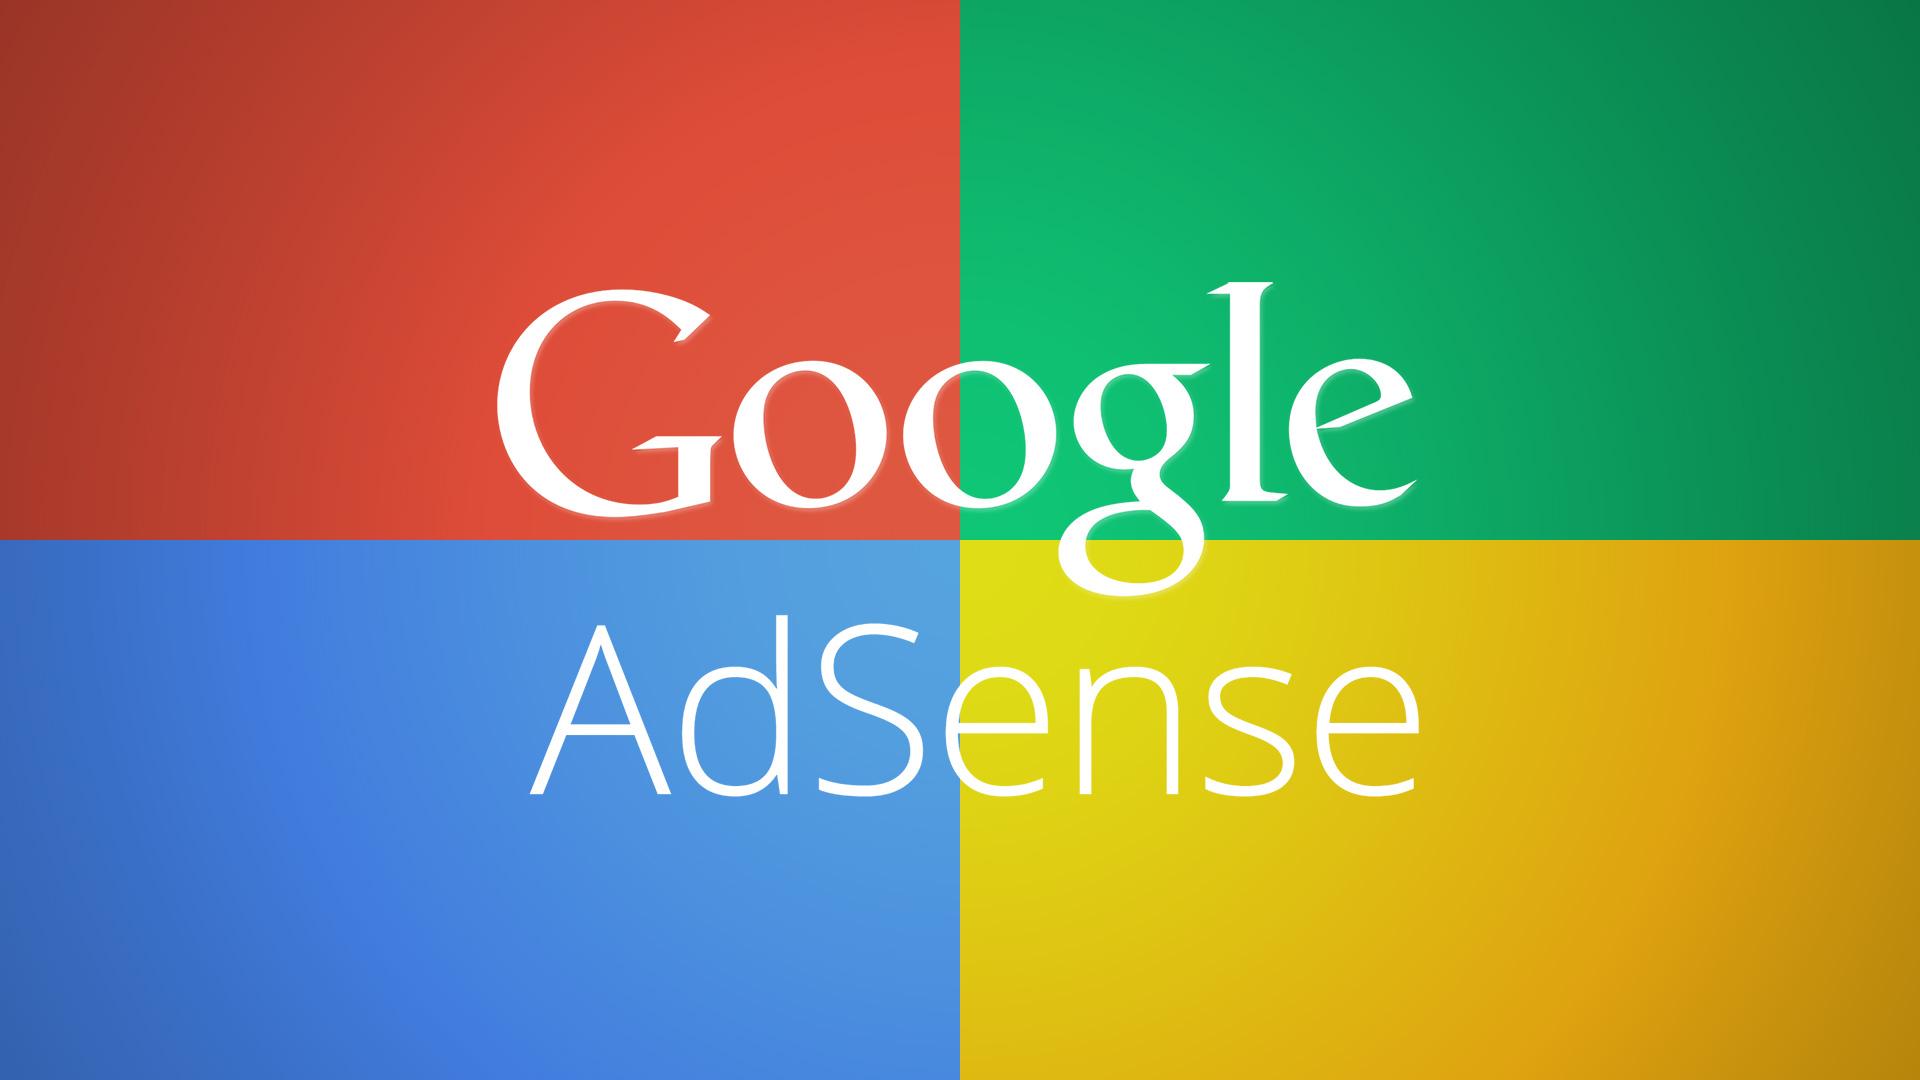 Google Adsense Easy Steps for Aprroval